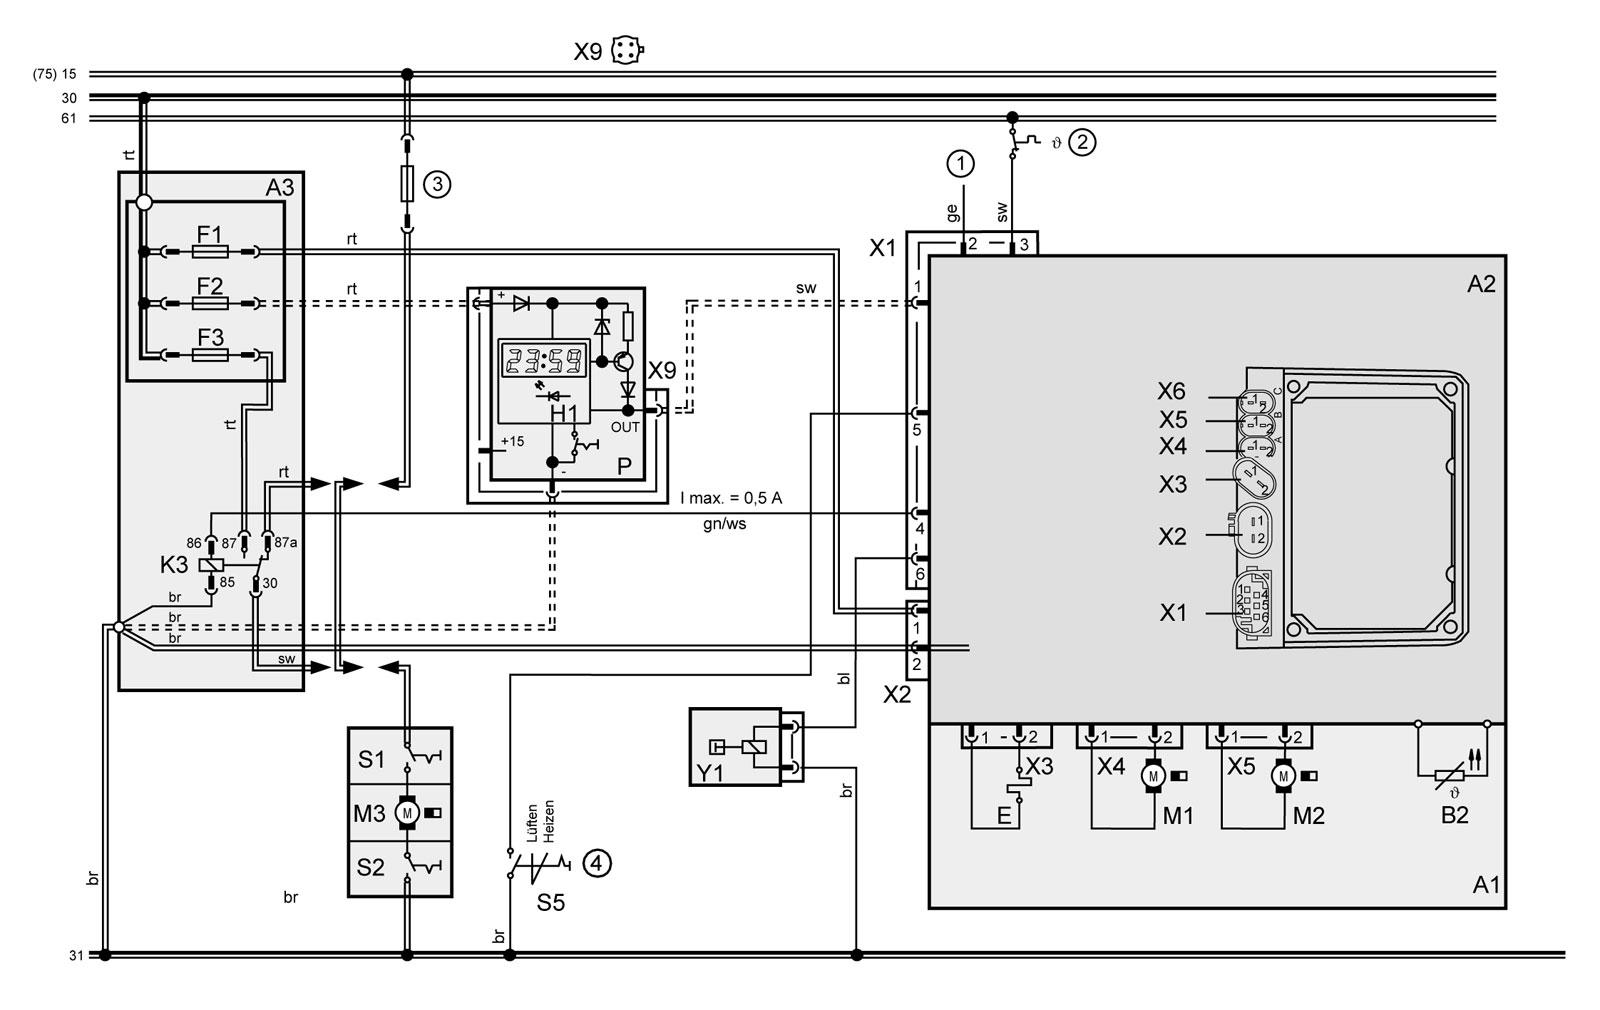 hight resolution of webasto sunroof parts diagram webasto free engine image for user manual download 1981 porsche 911 wiring